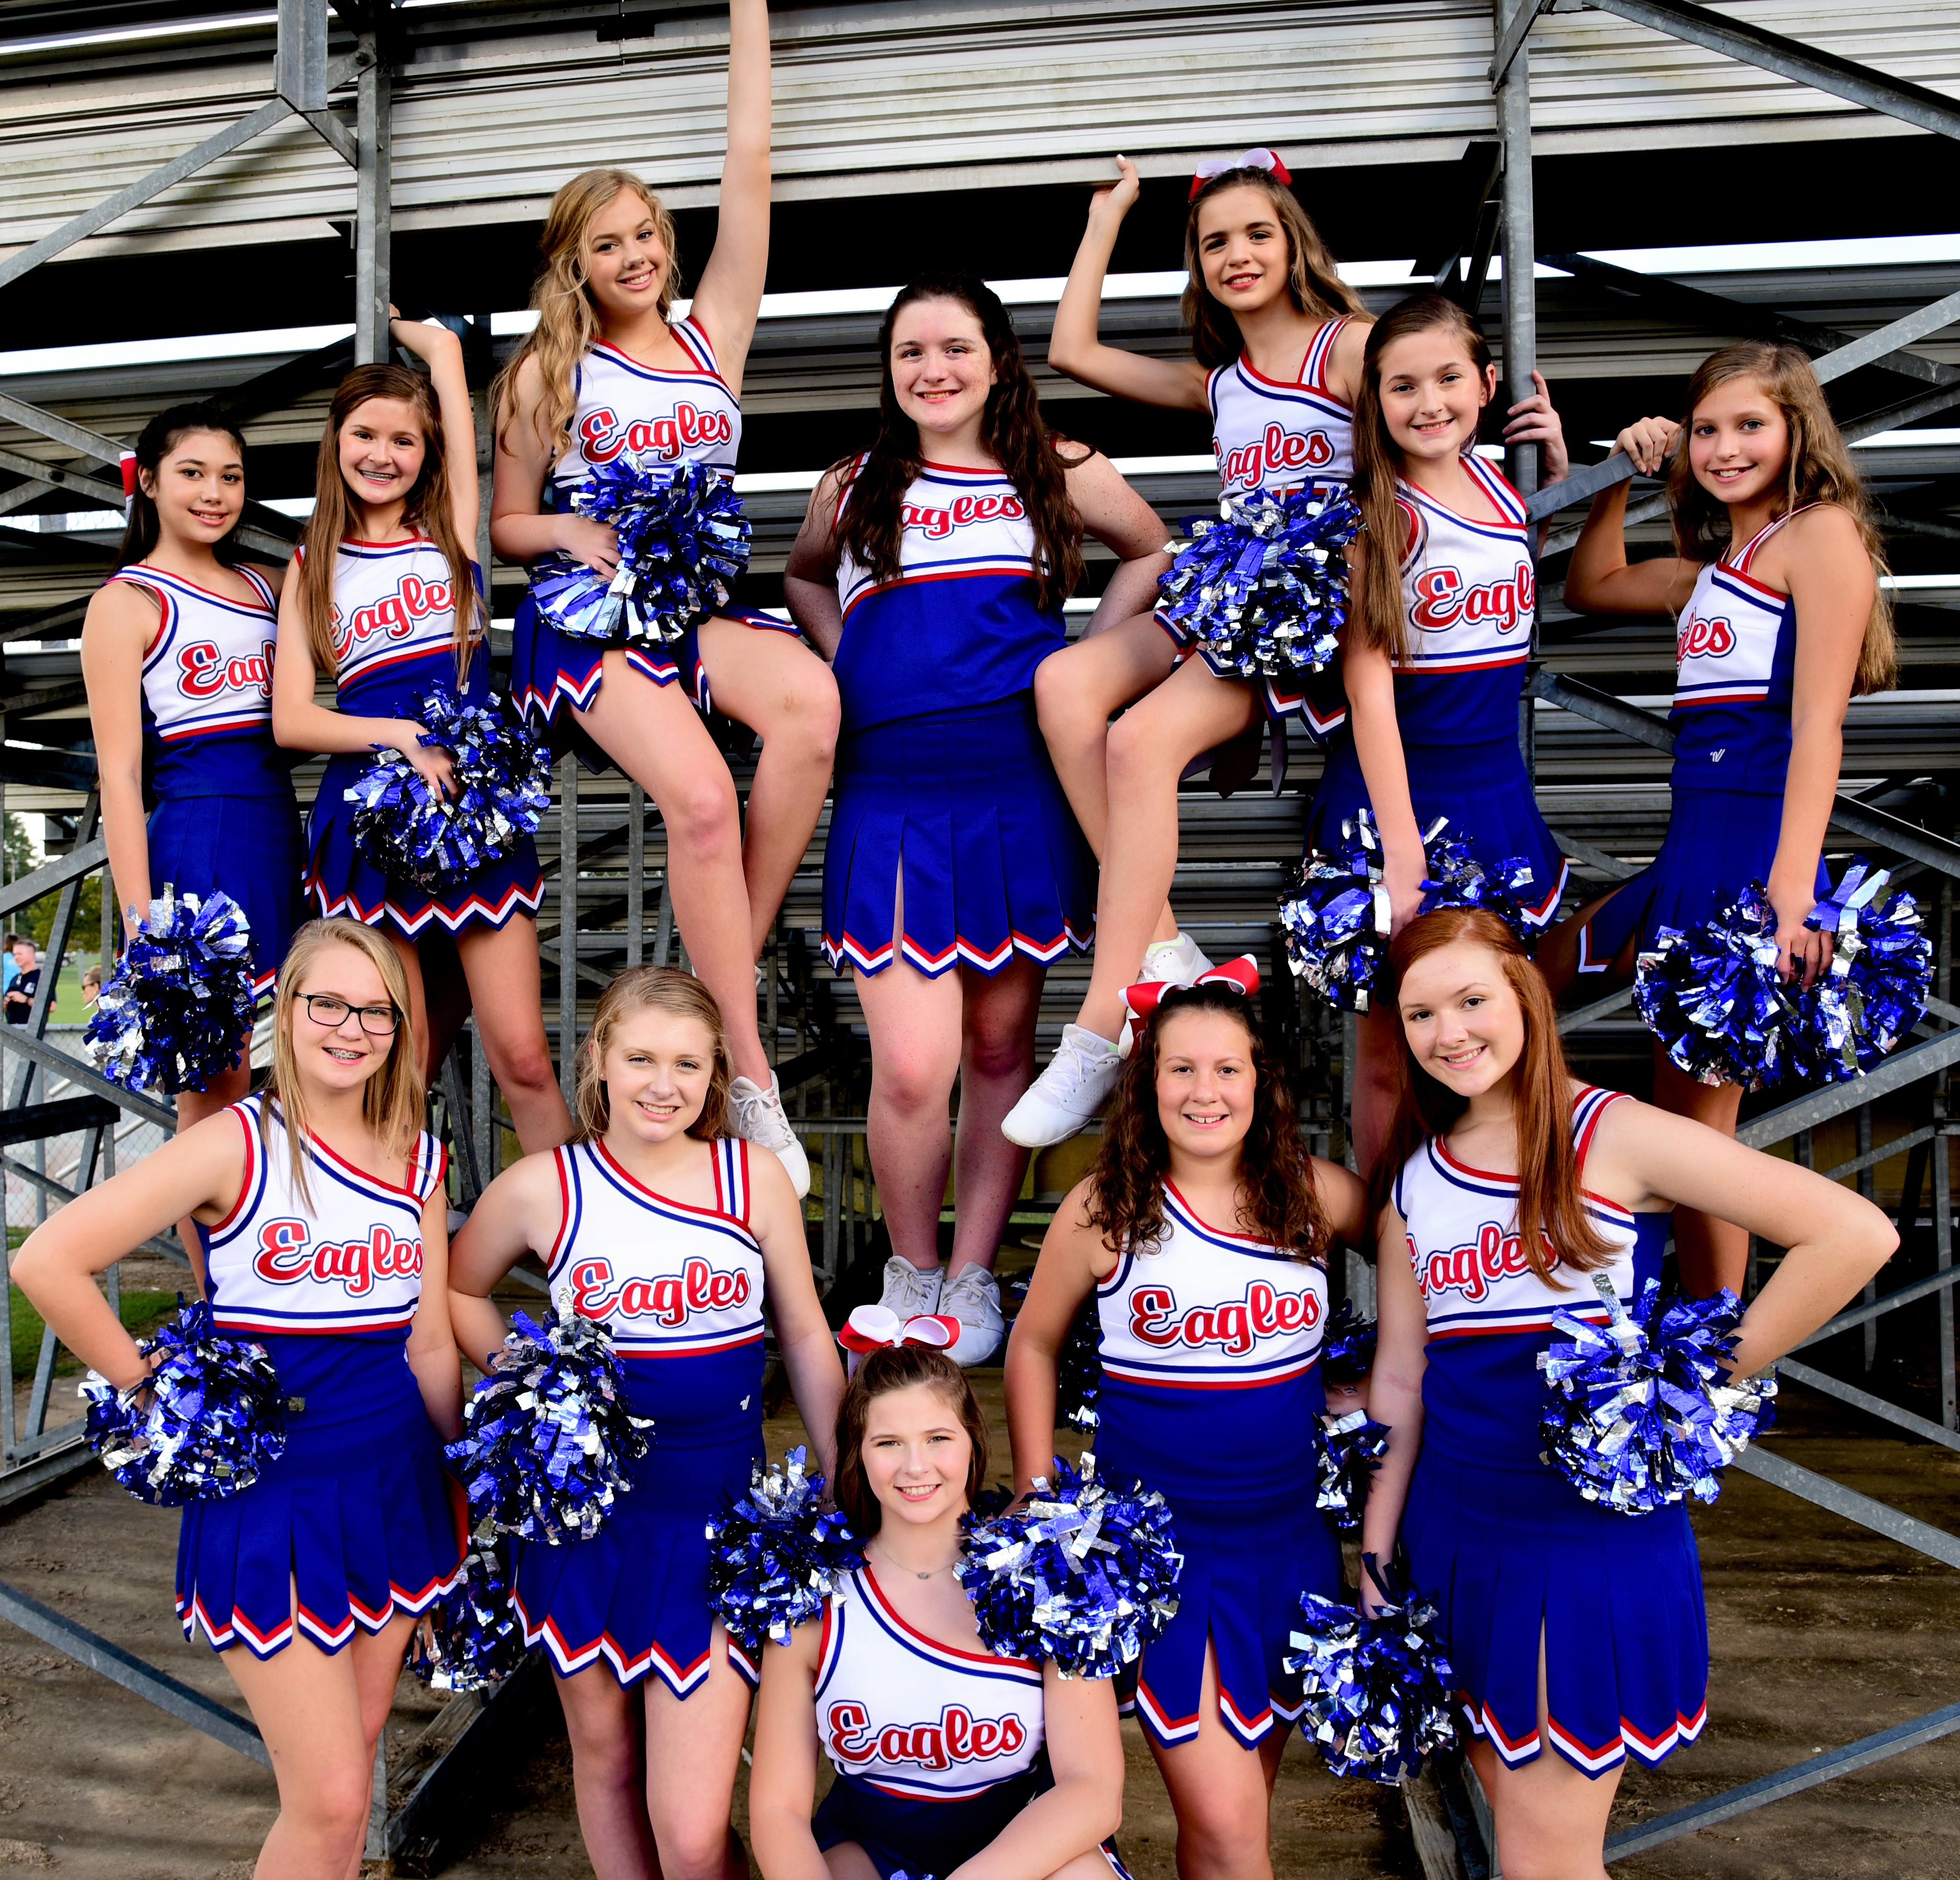 2018 Football Cheerleaders Behind the Stands